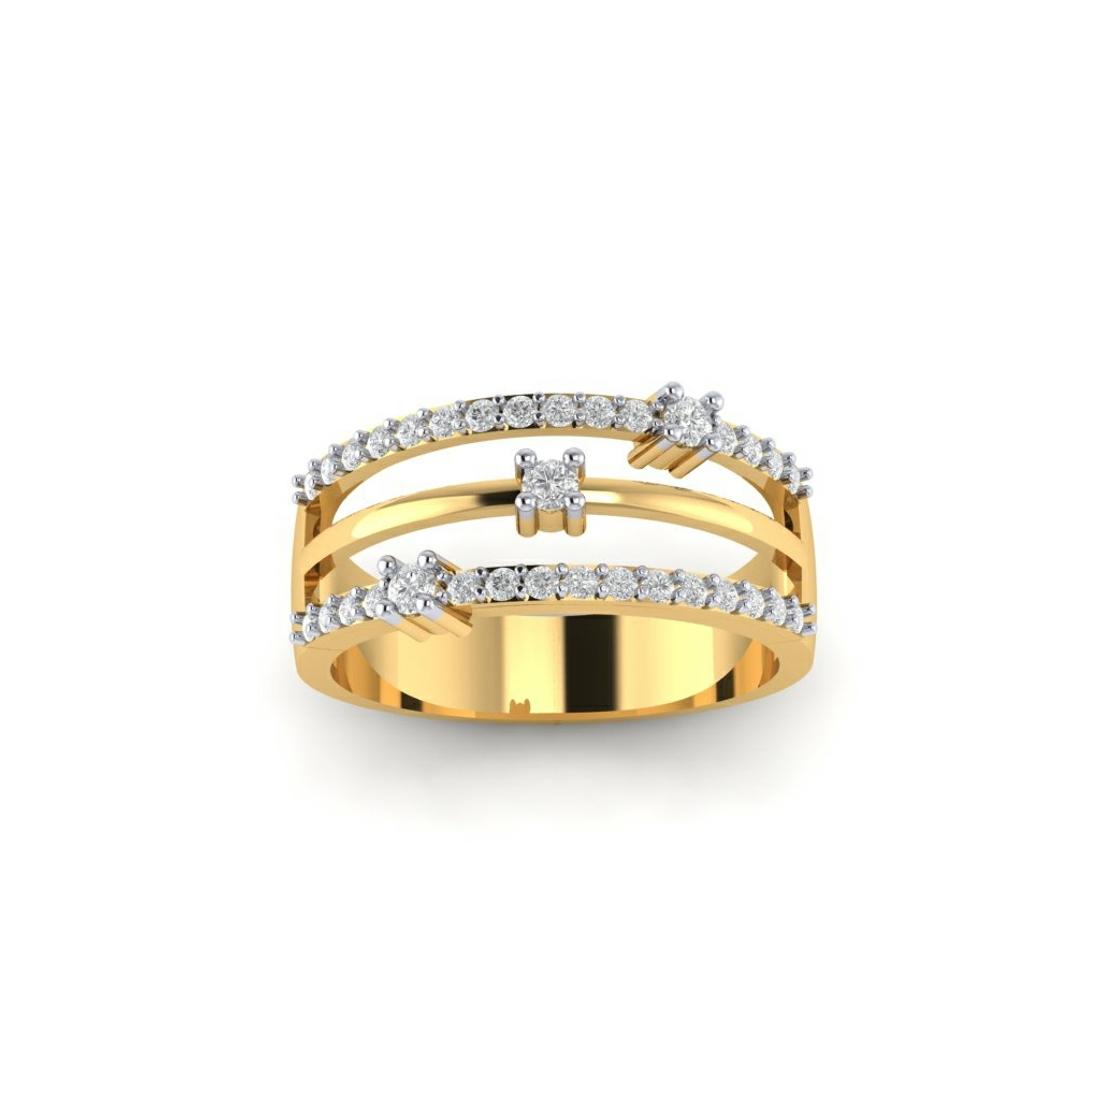 ANKUR JEWELS-DIAMOND STUDDED RING